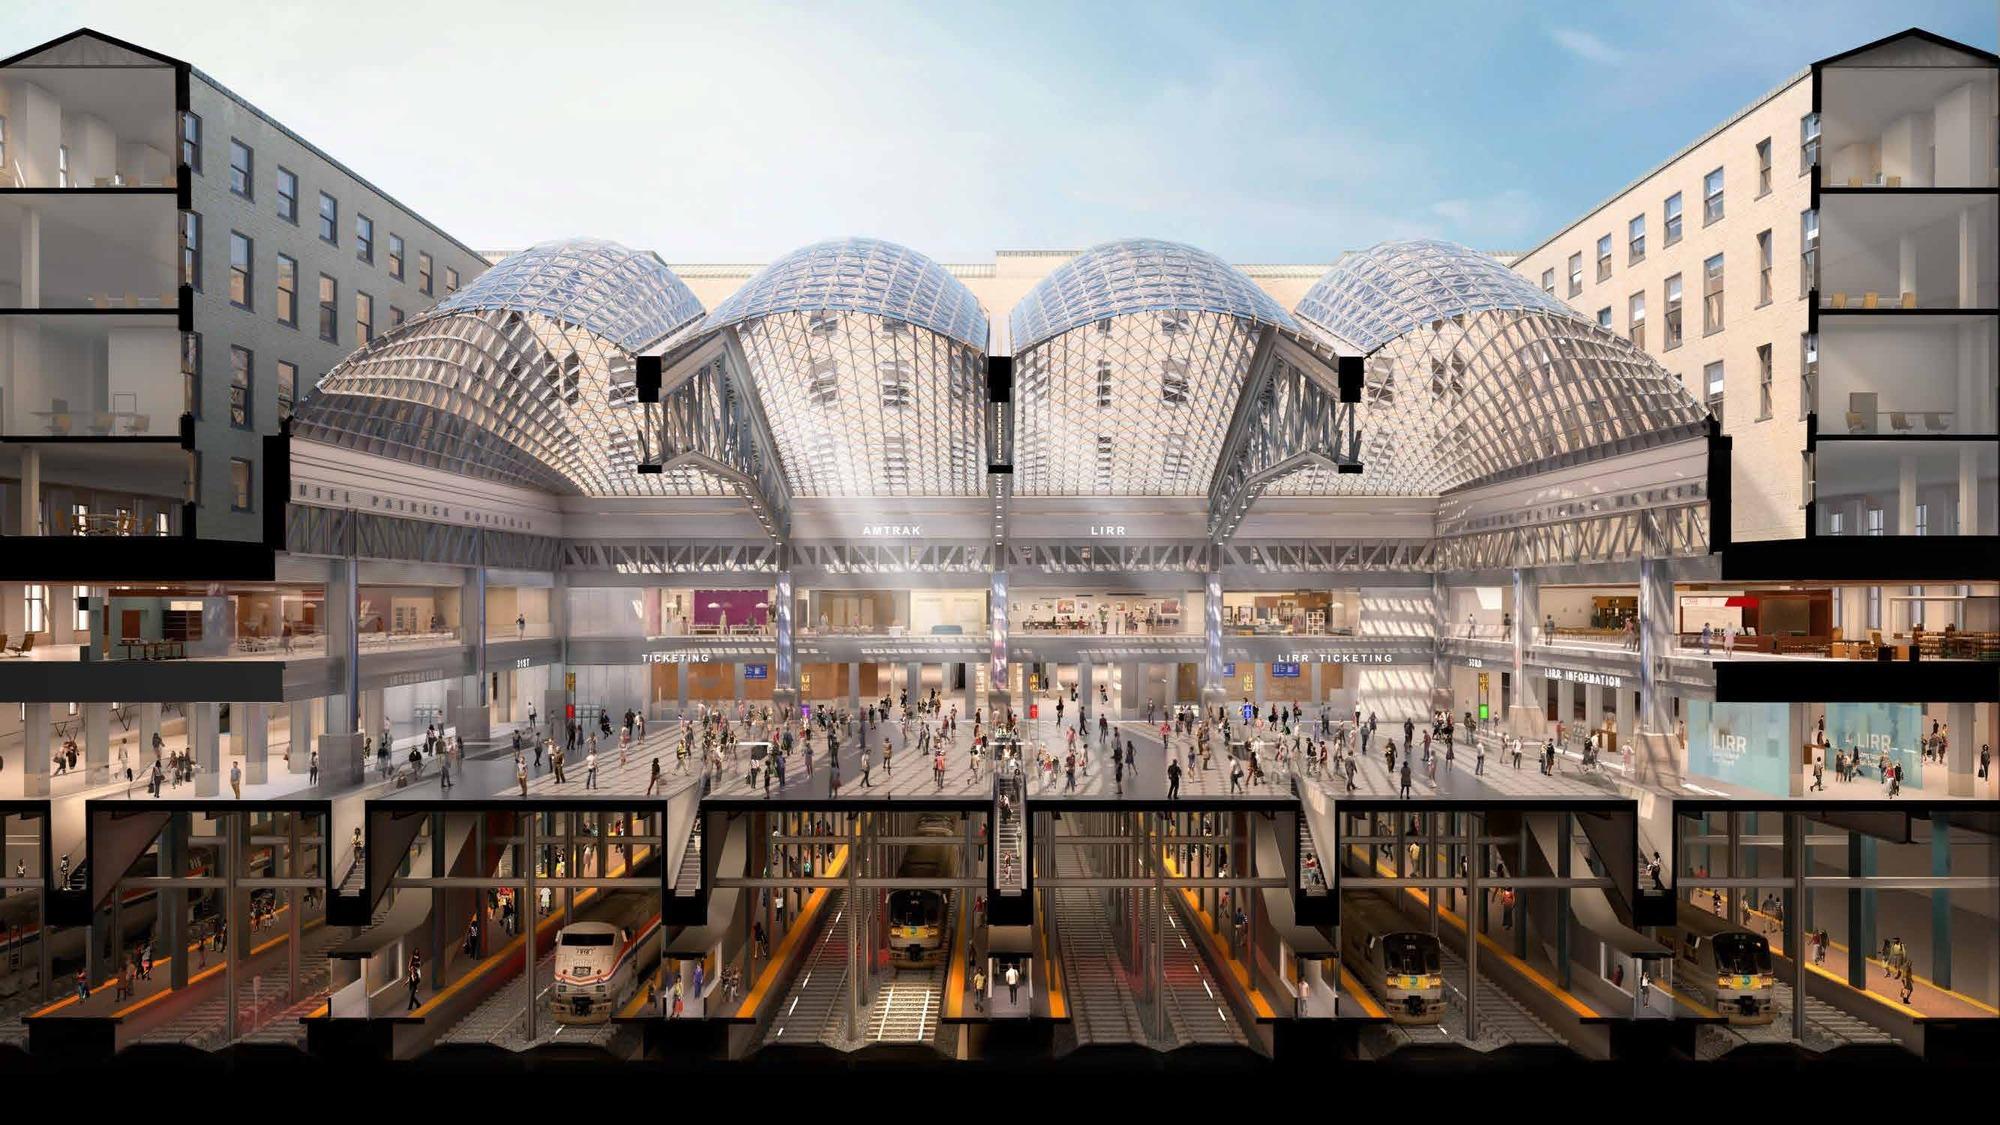 Construction Begins on Penn Station's Moynihan Train Hall Transformation